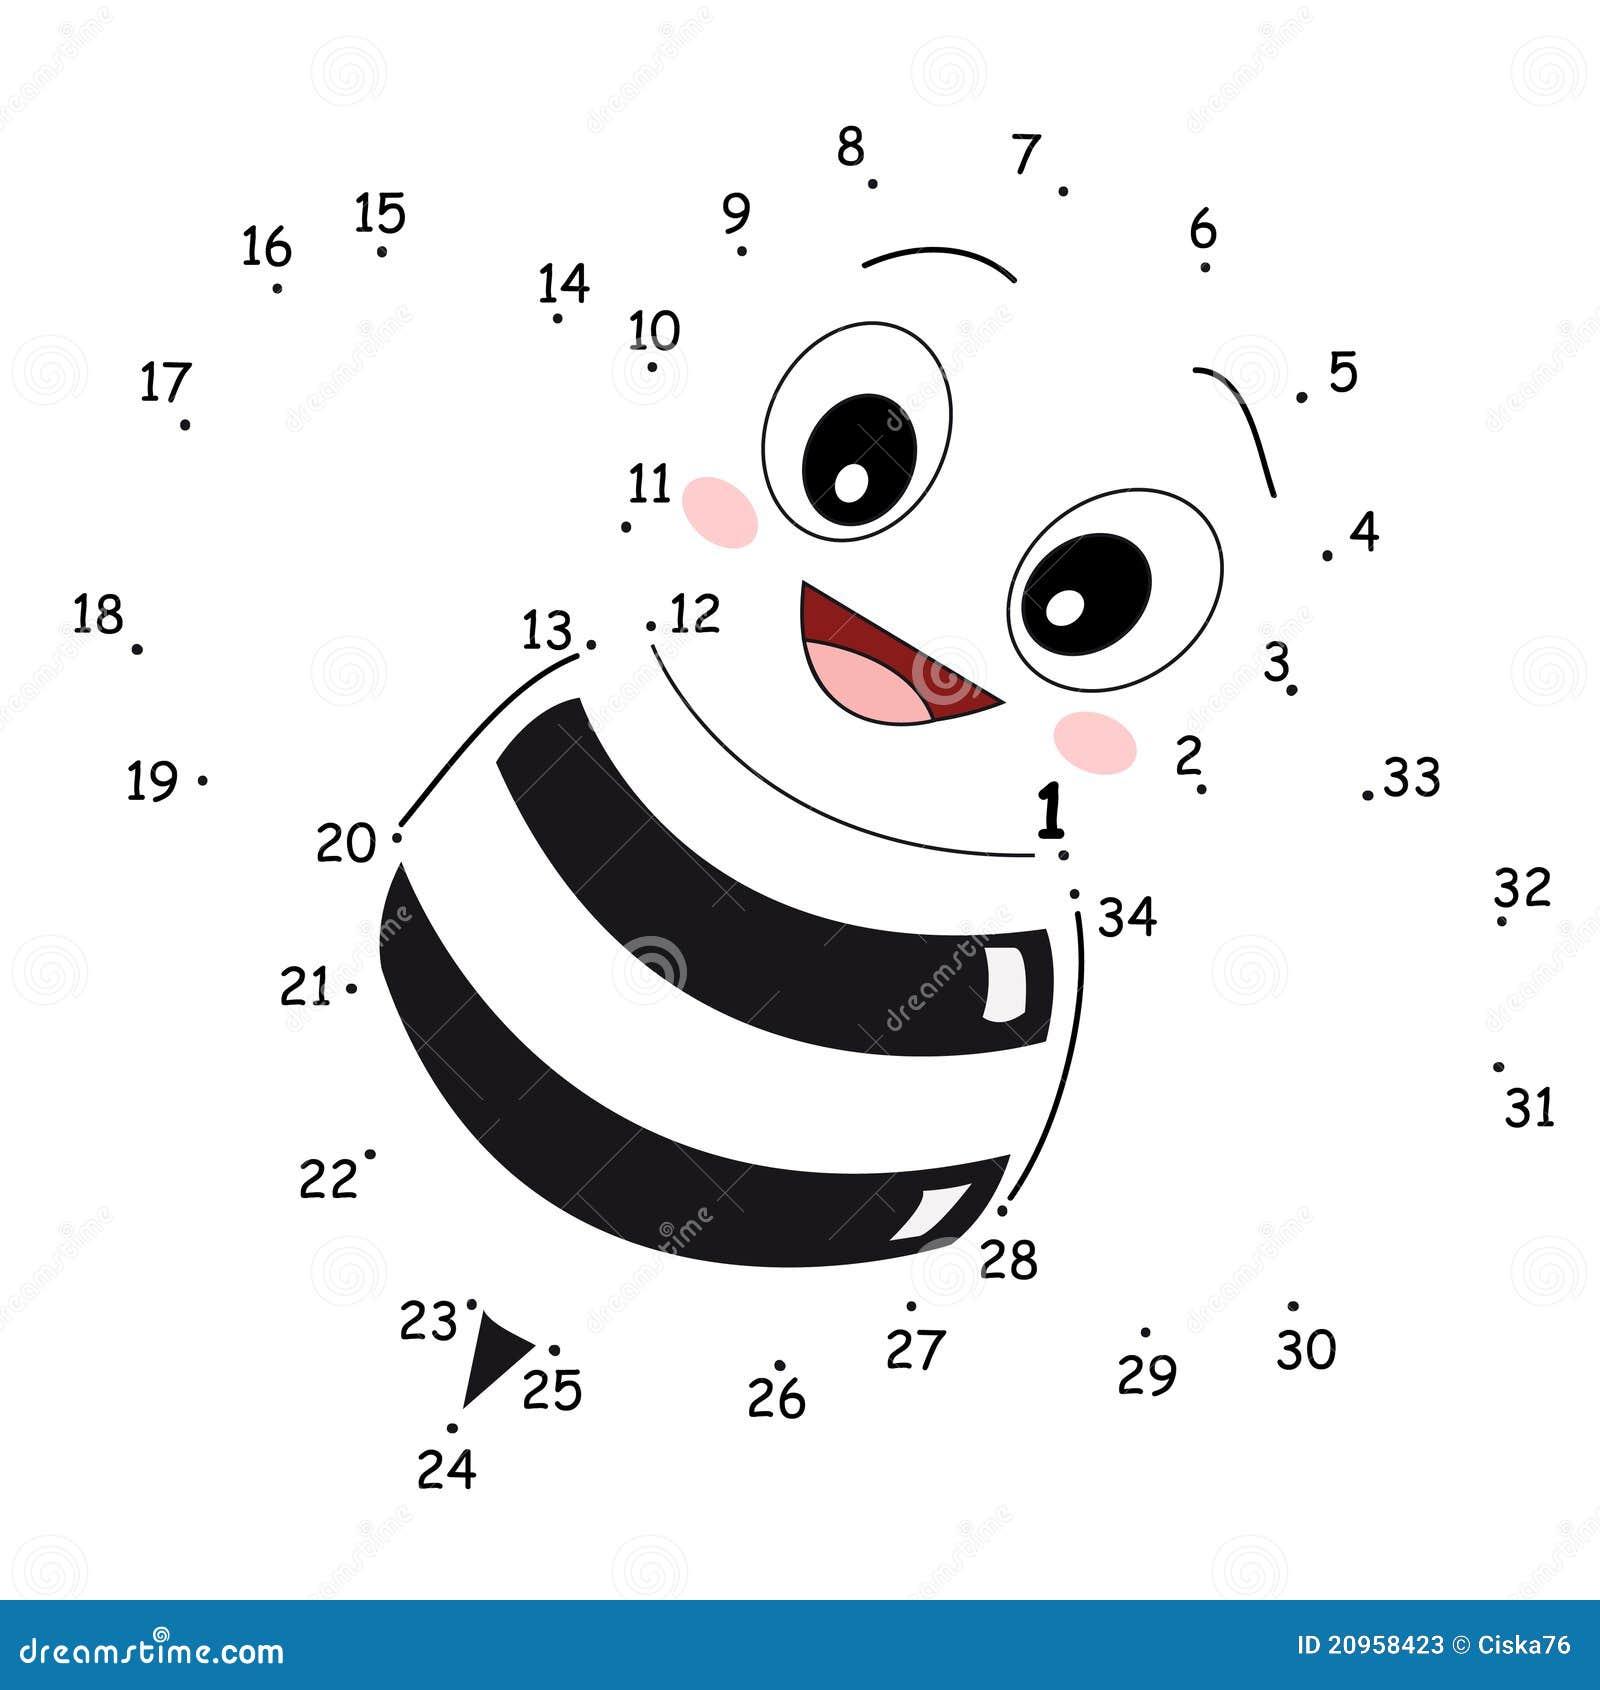 dot to dot worksheets 1 20